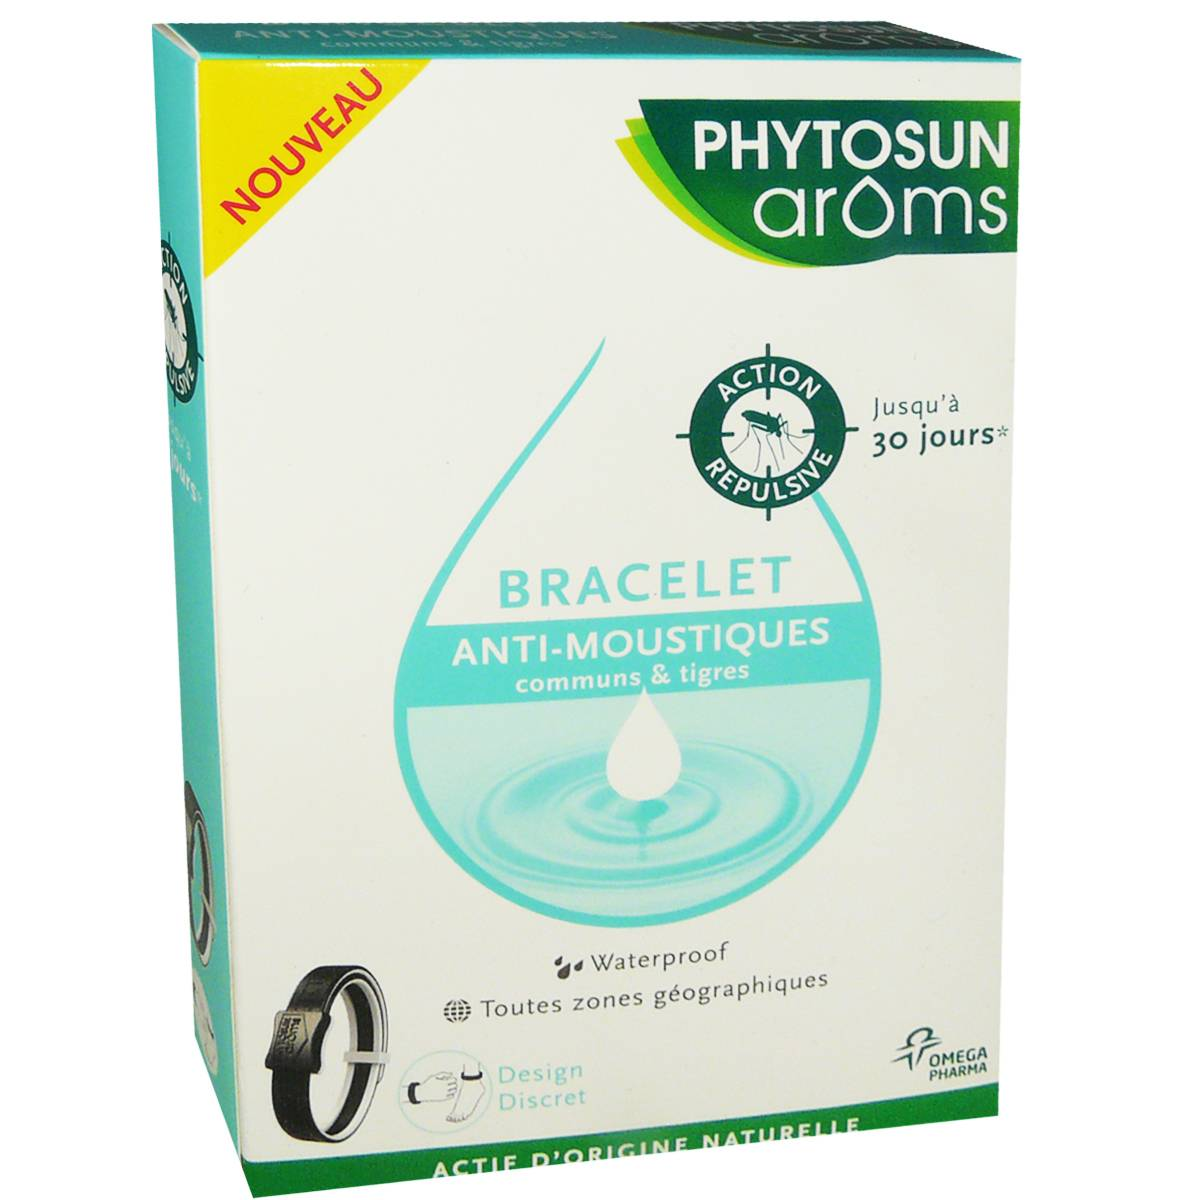 Phytosun aroms bracelet anti-moustiques waterproof